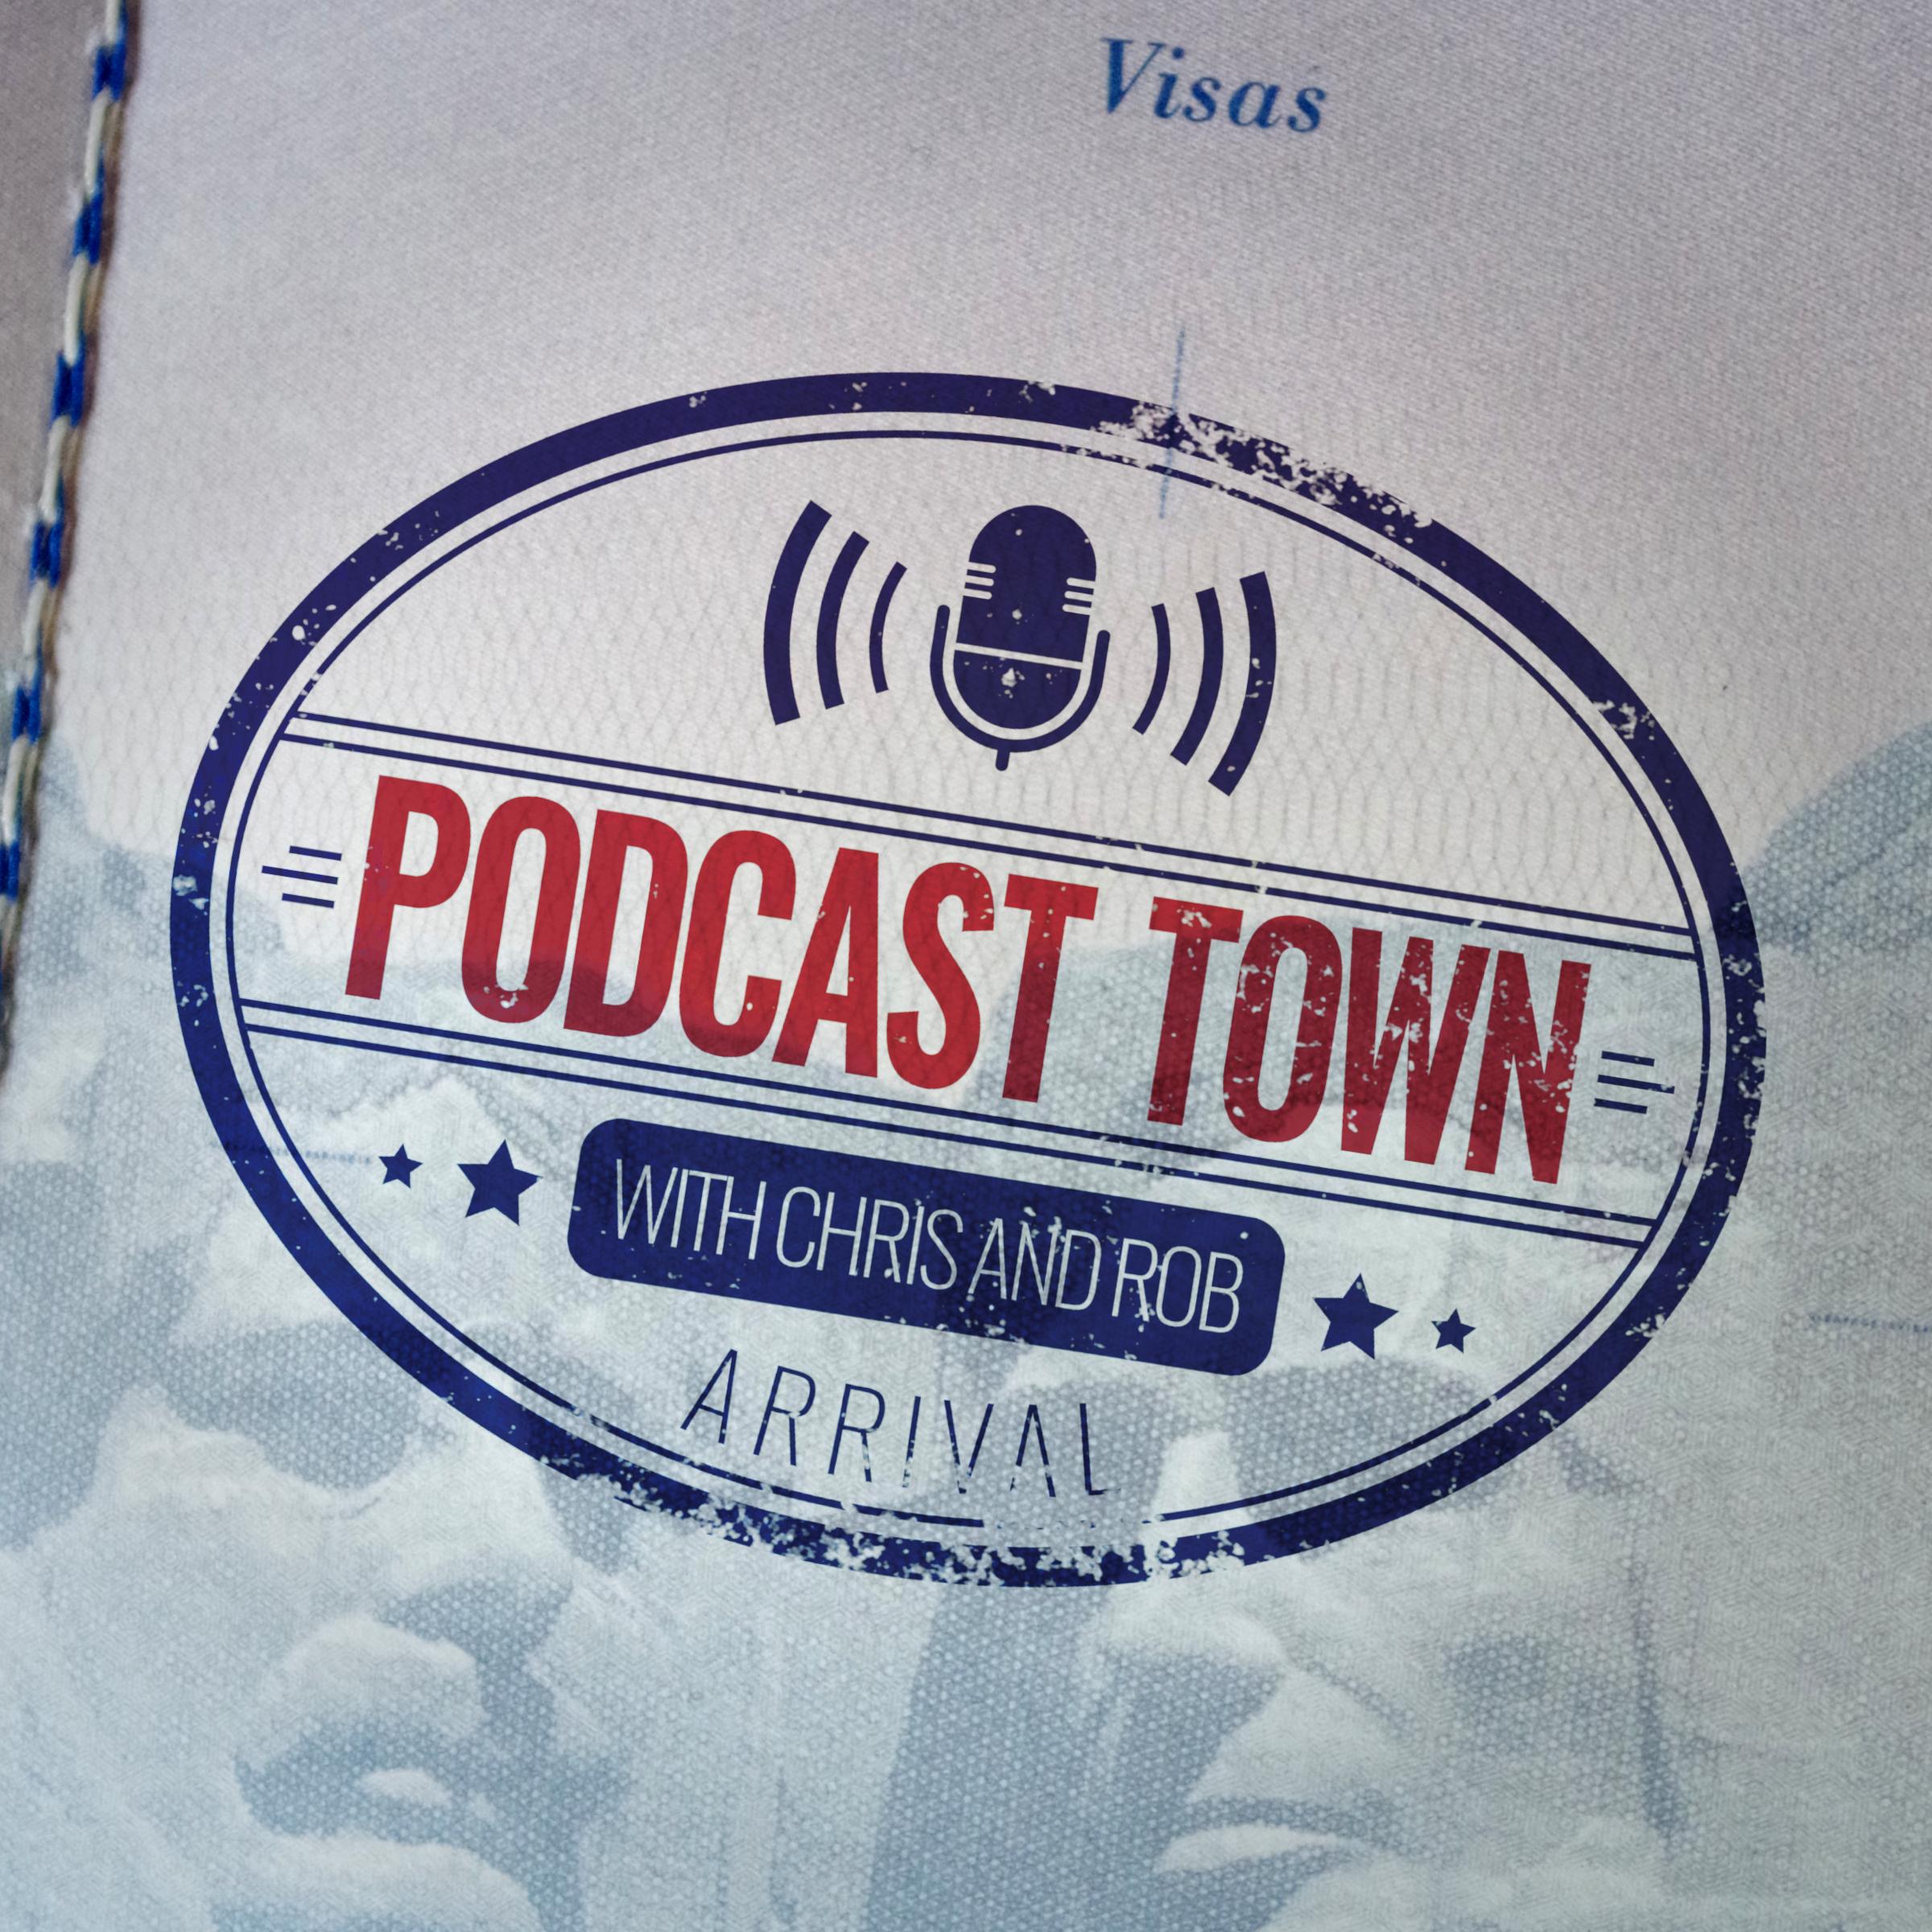 Artwork for Podcast Town Trailer